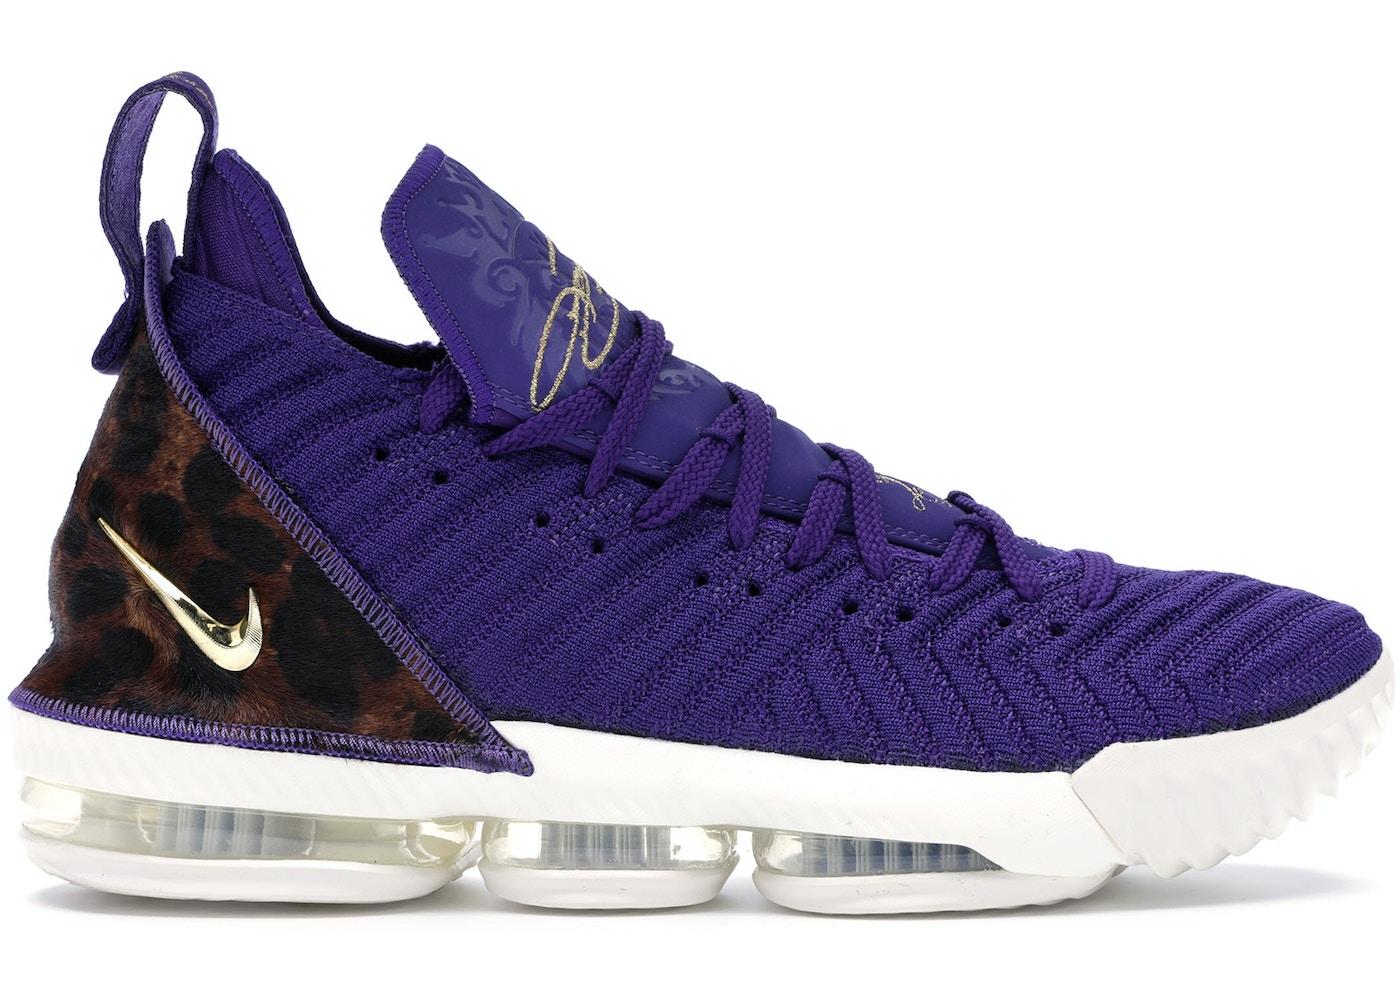 355d772c4319 Nike LeBron Shoes - Highest Bid